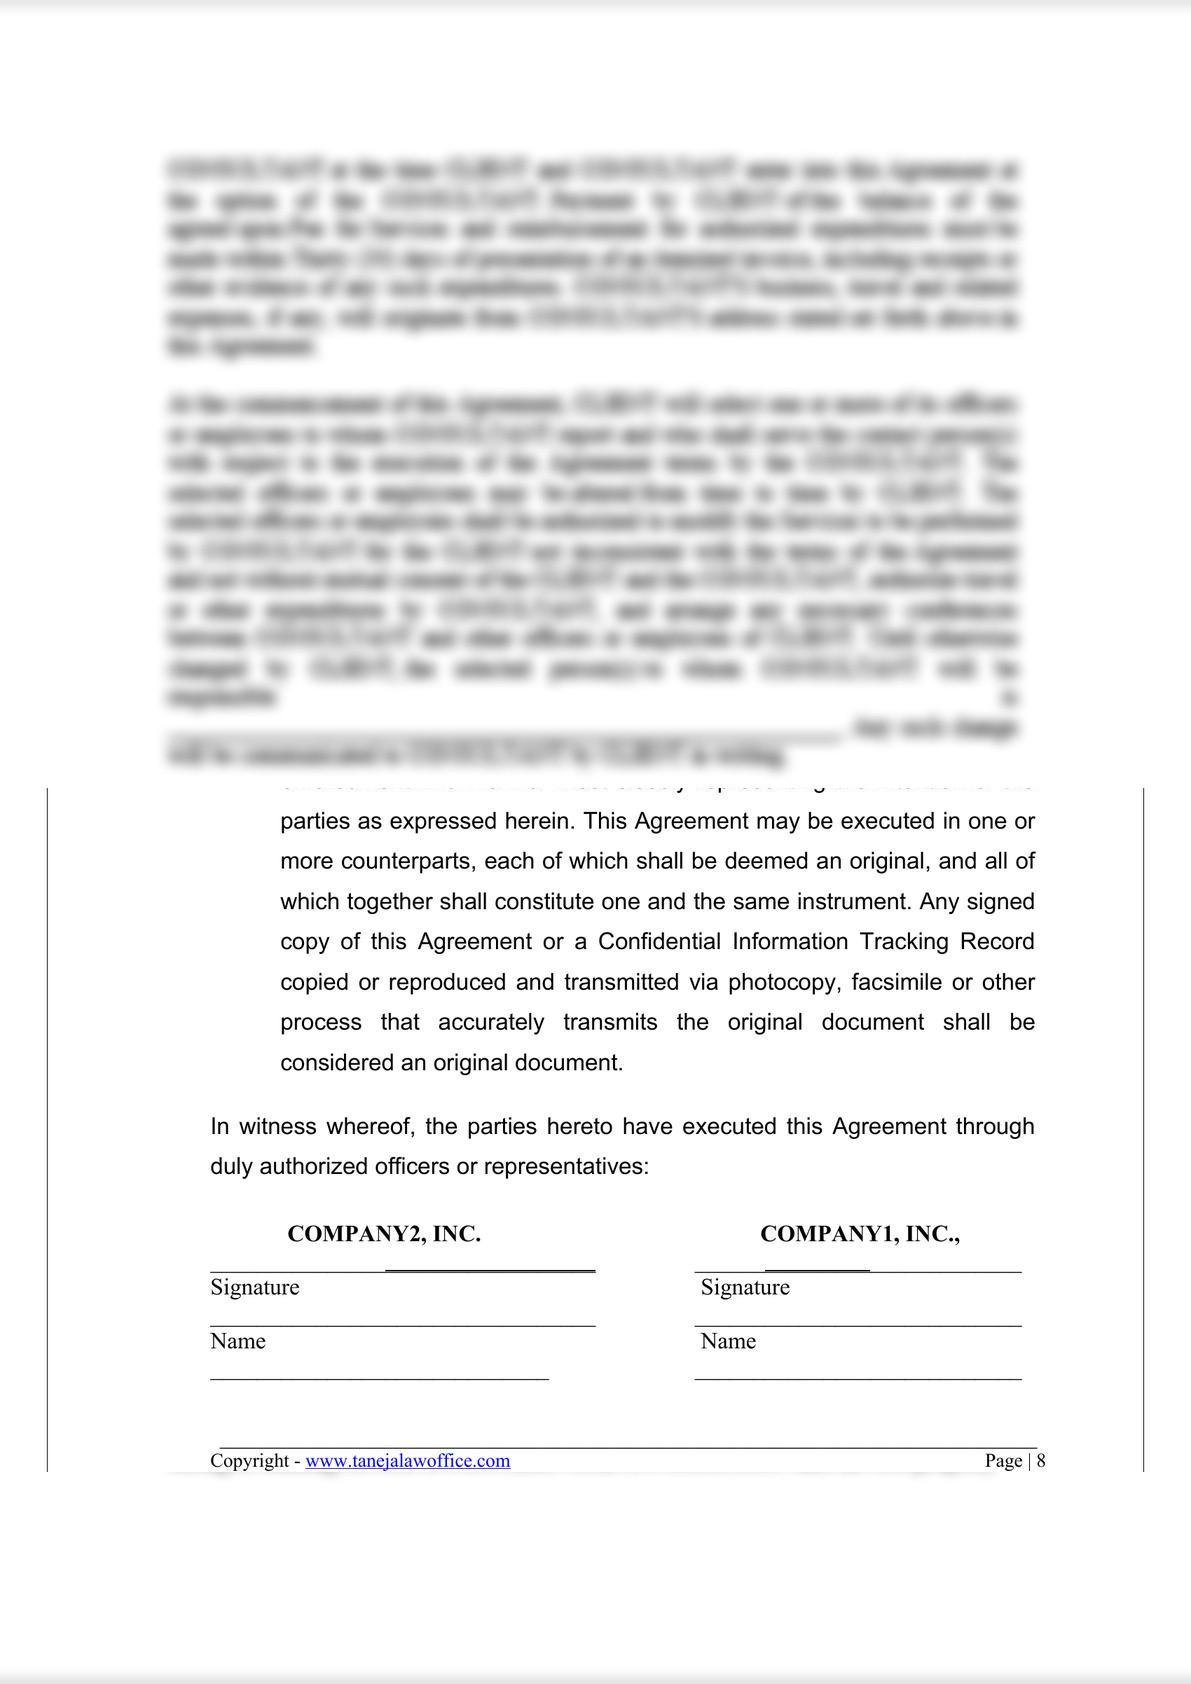 Mutual Non-Disclosure Agreement-5